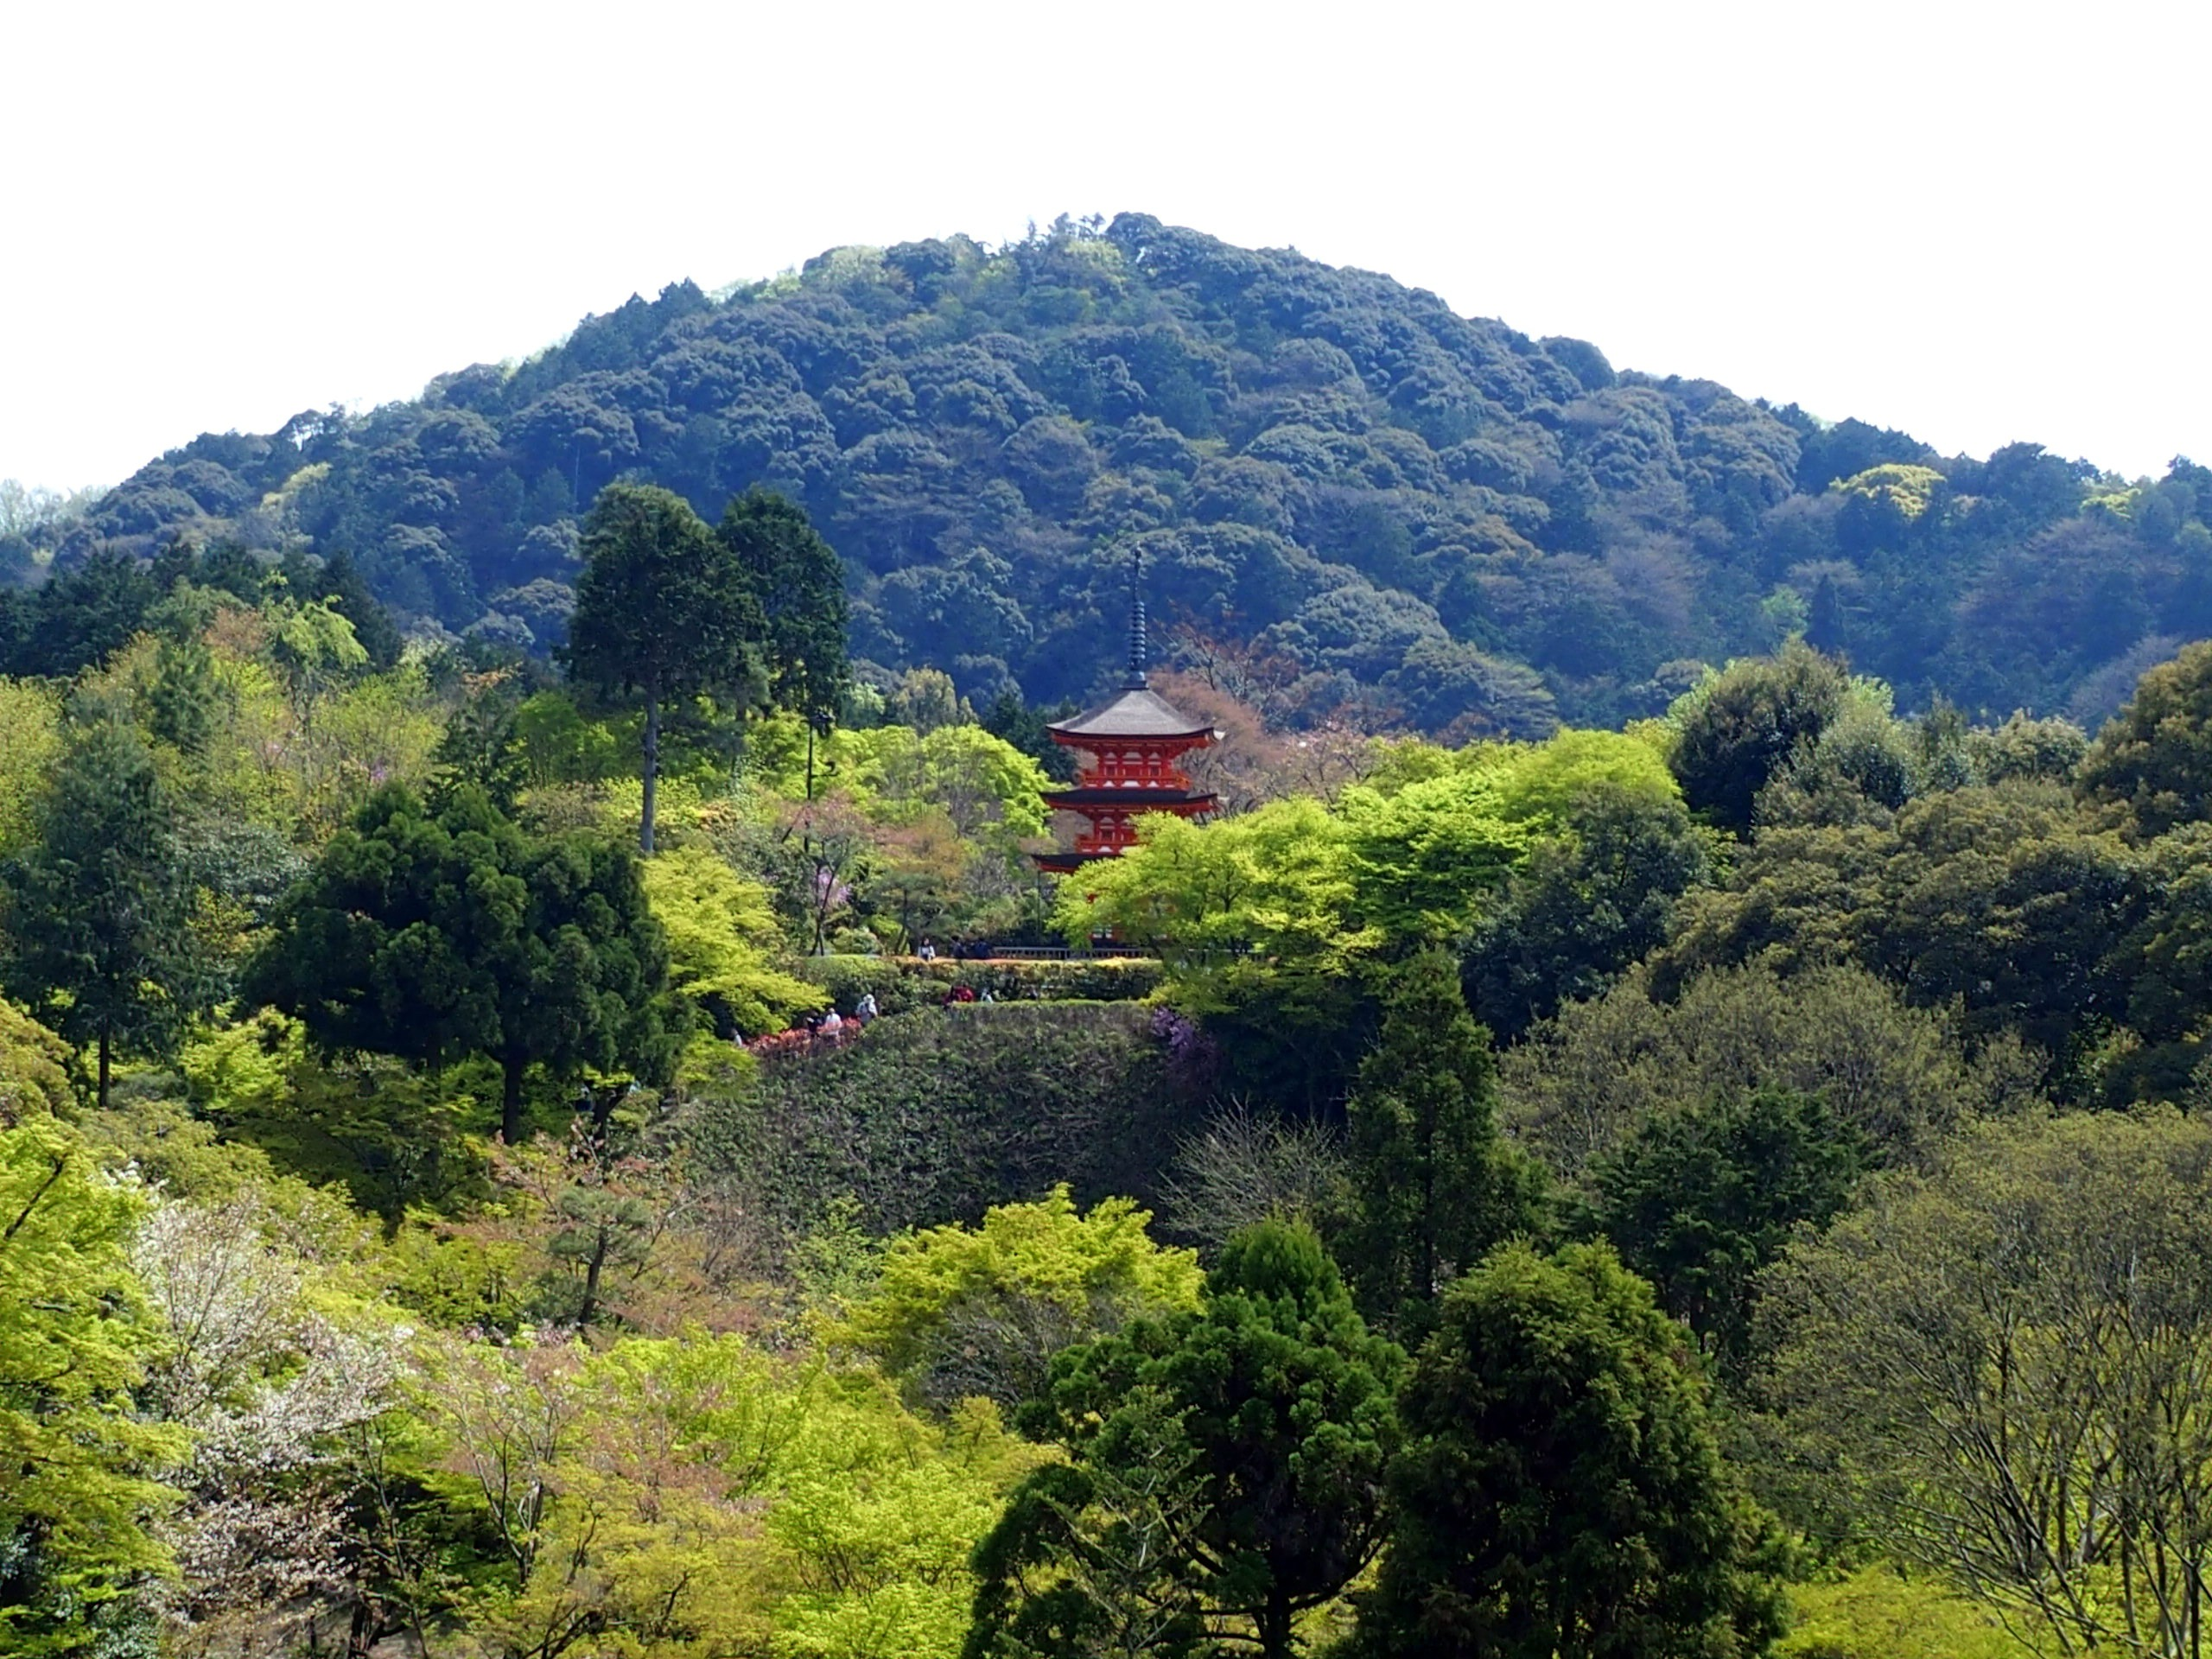 Vue depuis la plateforme du temple Kiyomizu-Dera